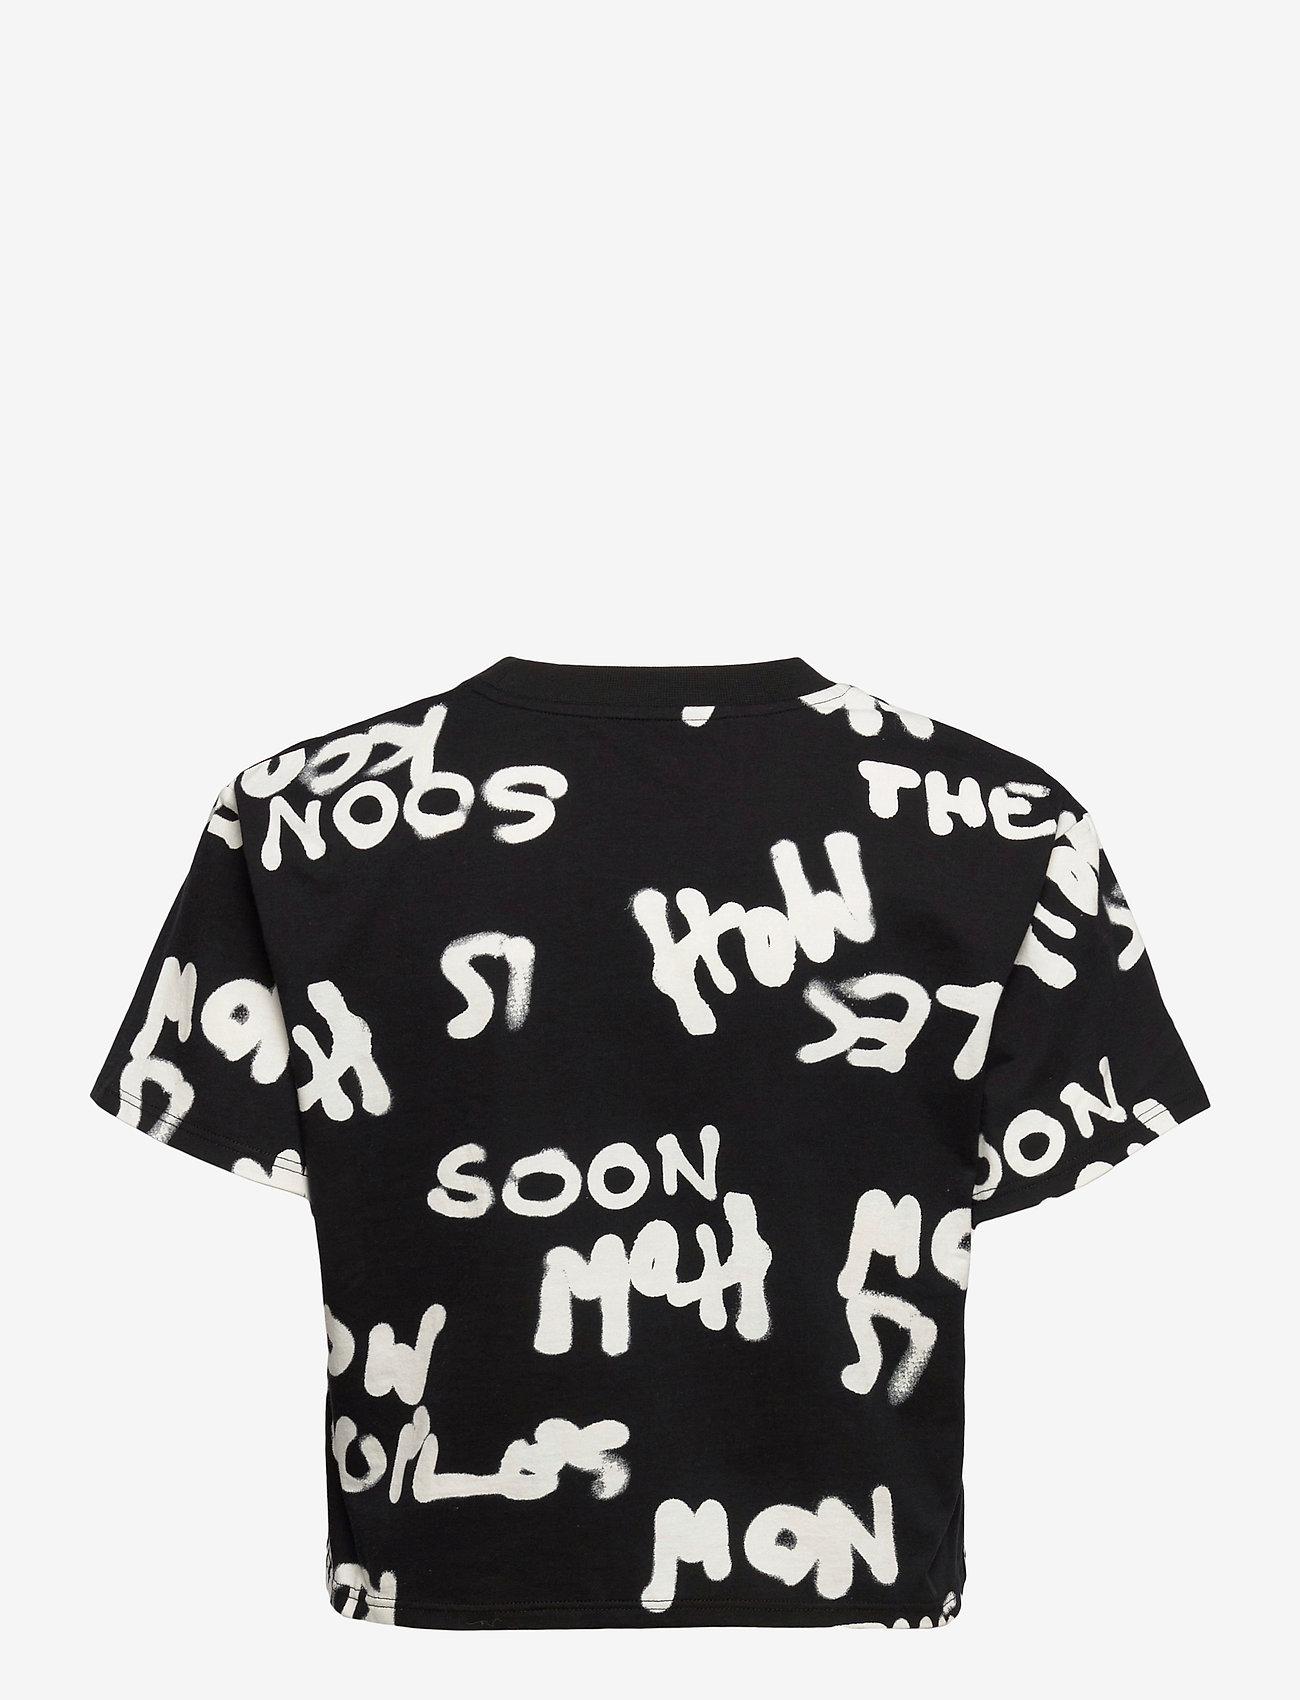 The Kooples - T-SHIRT - t-shirts - black - 1